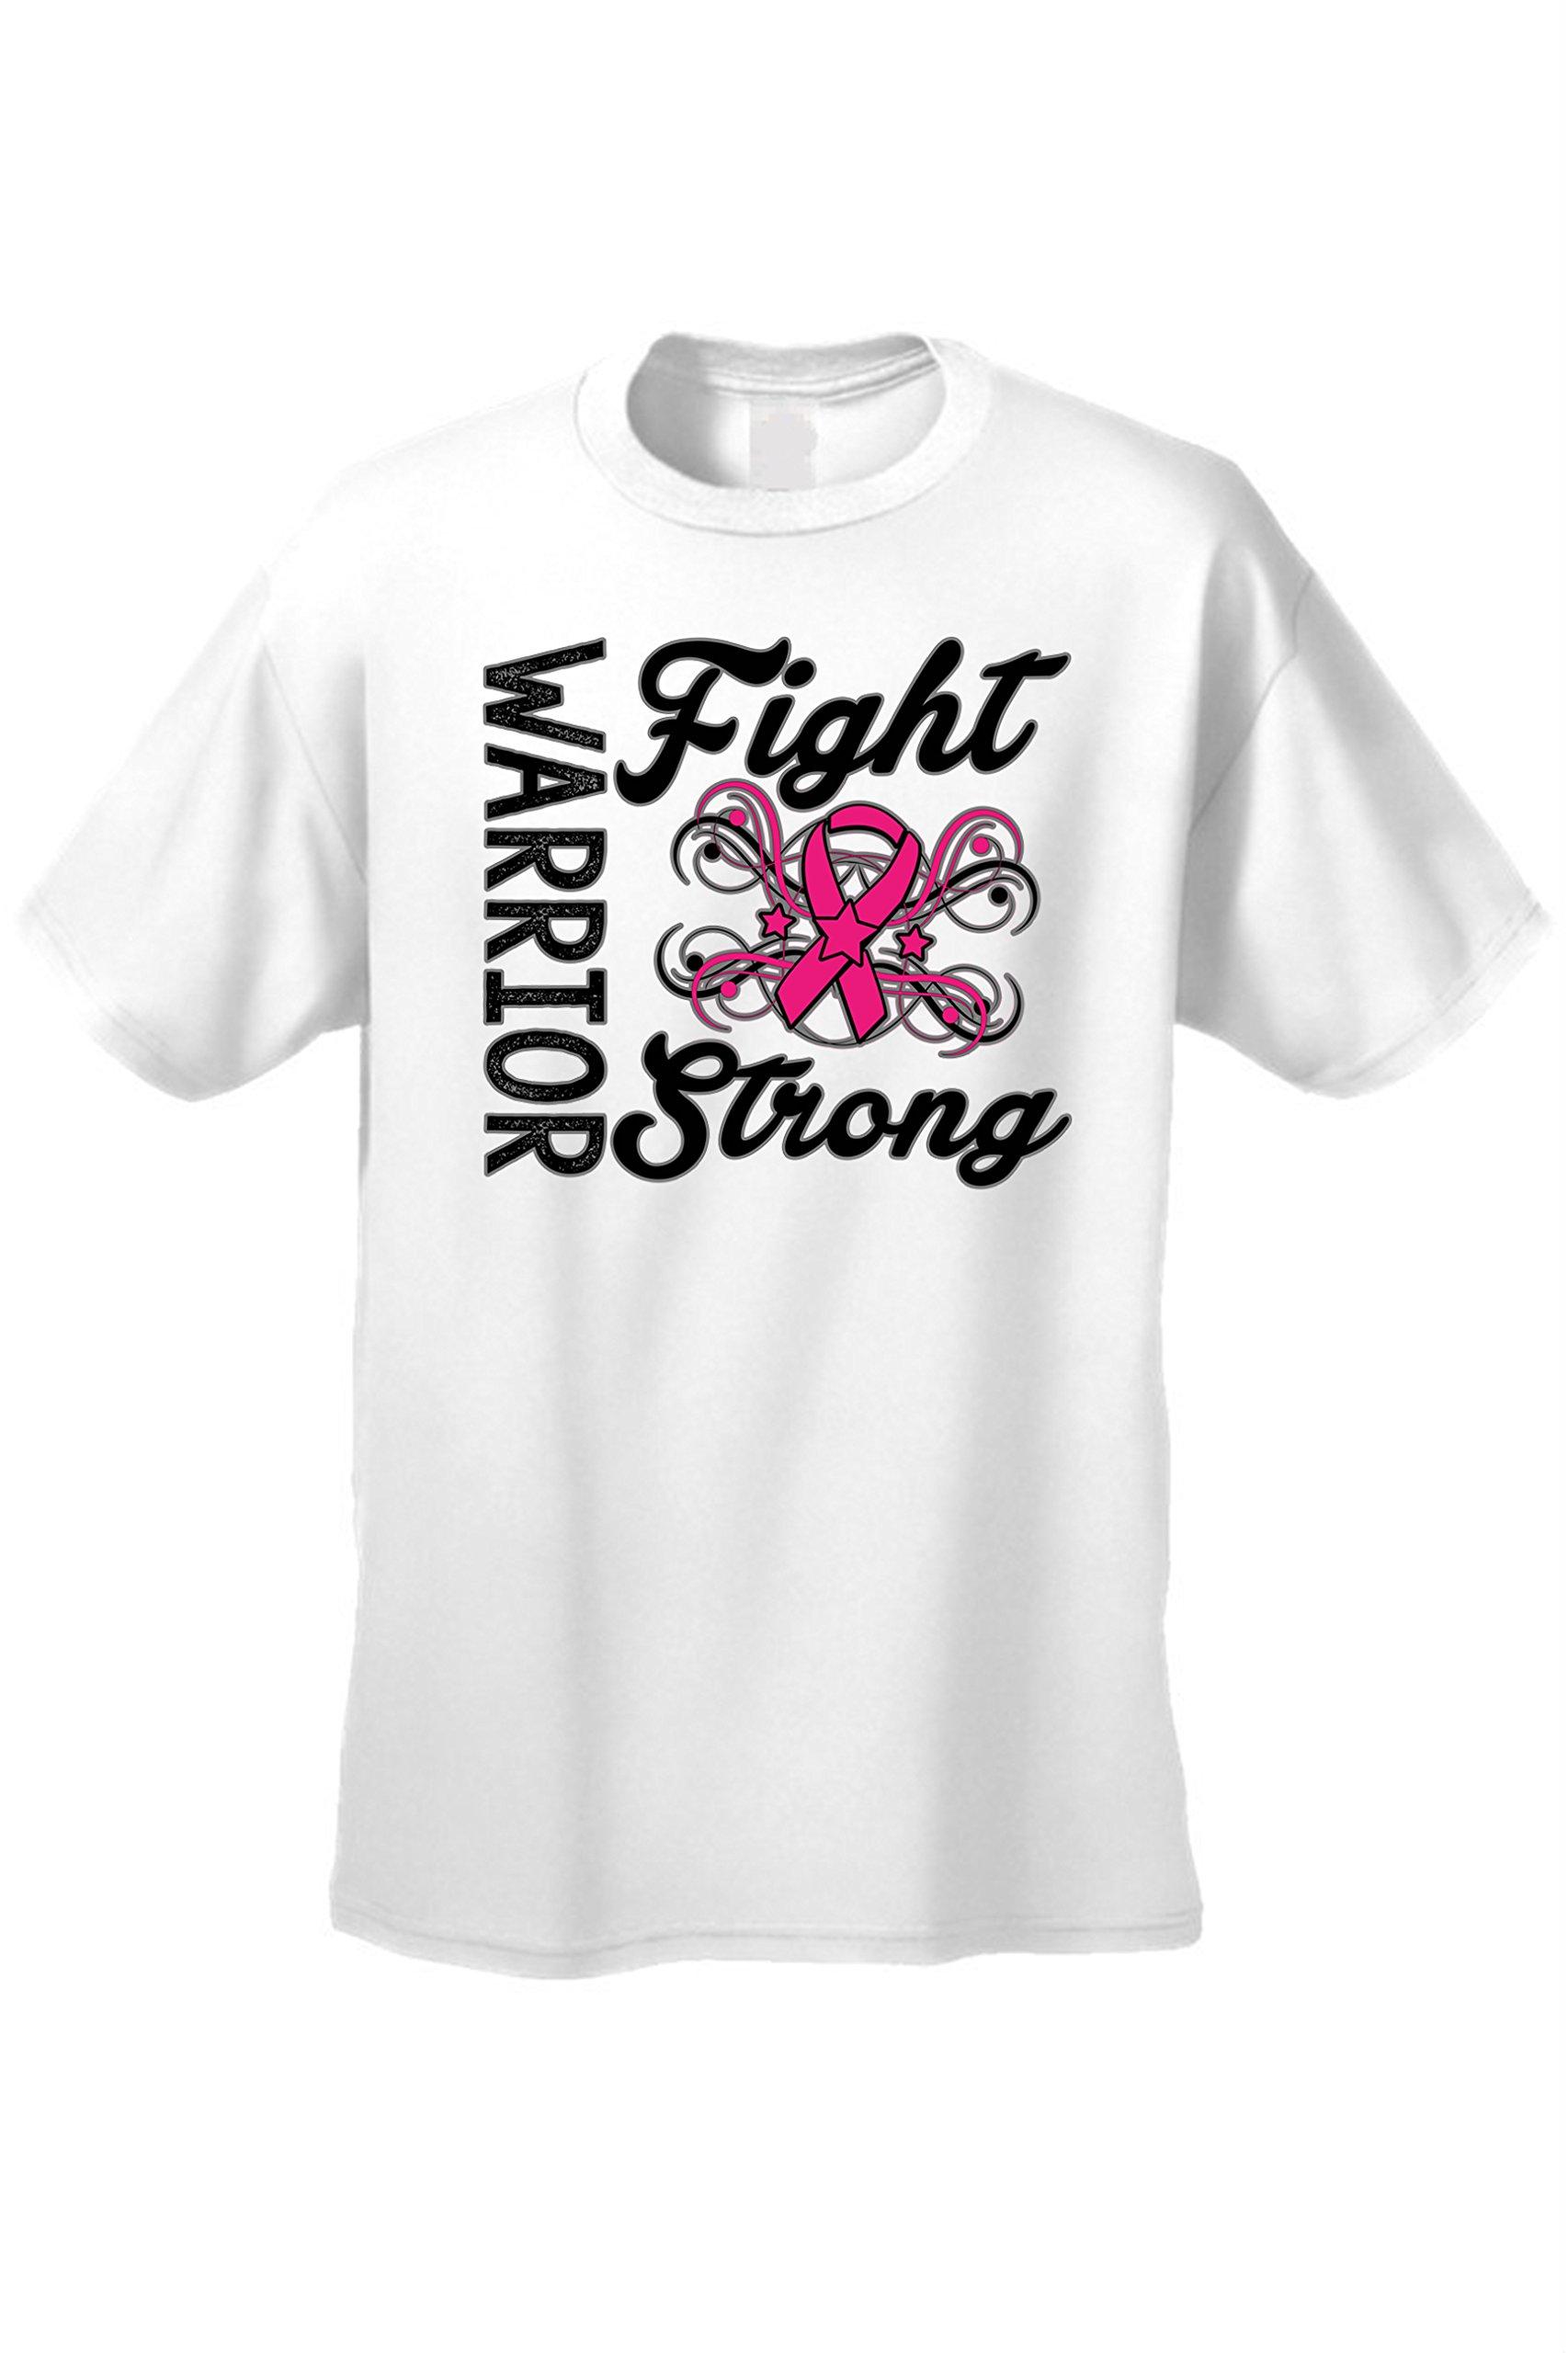 Unisex Warriors Fight Strong Breast Cancer Awareness T Shirt